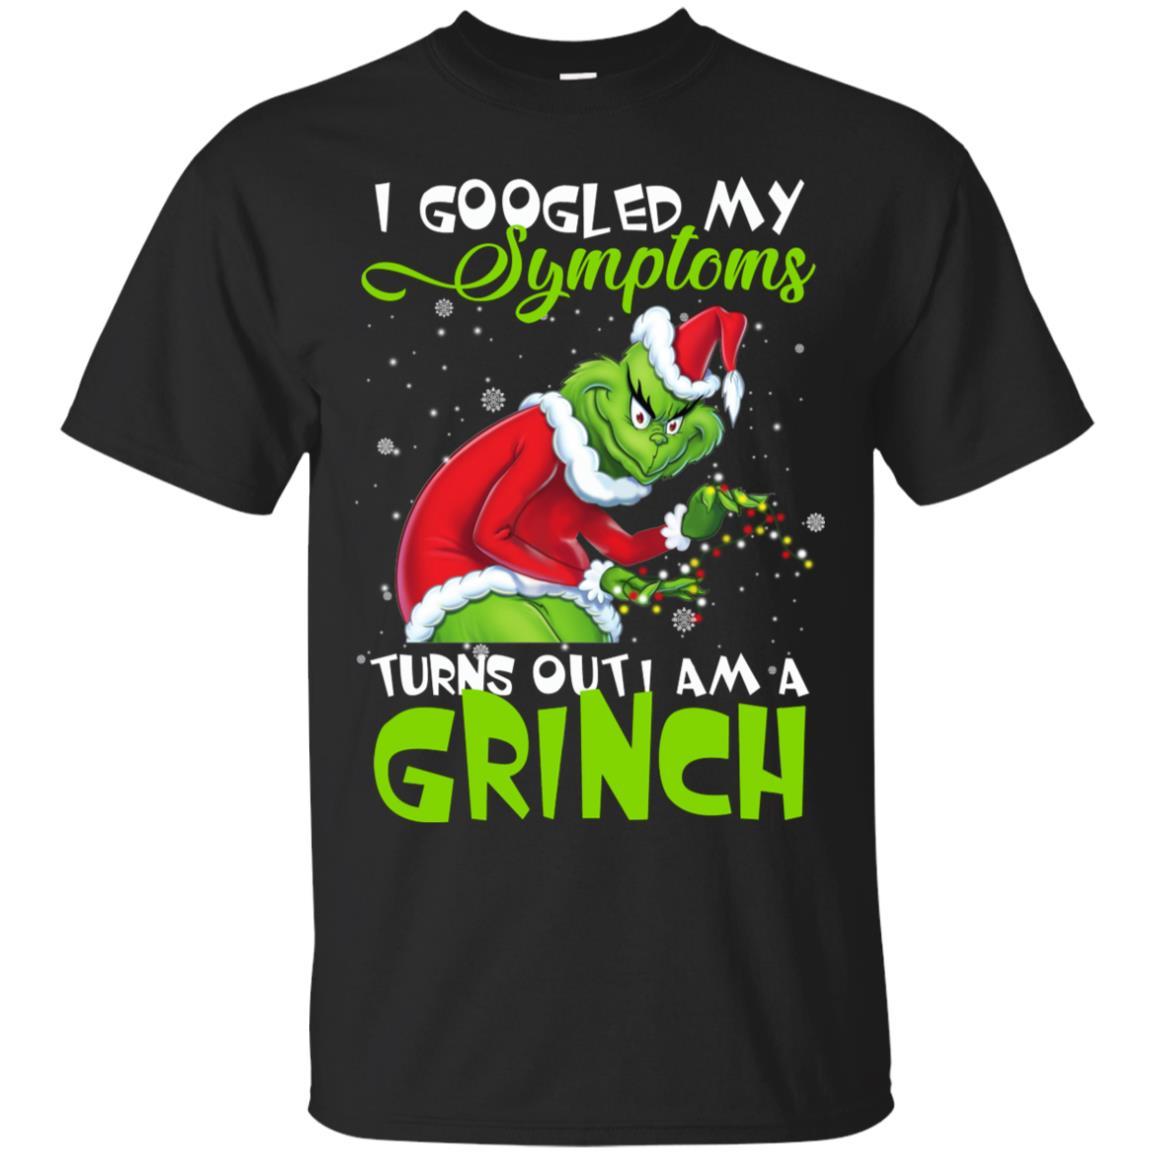 My Symptoms Is A Grinch. Funny Christmas Men's T-Shirt. Summer Cotton Short Sleeve O-Neck Unisex T Shirt New S-3XL